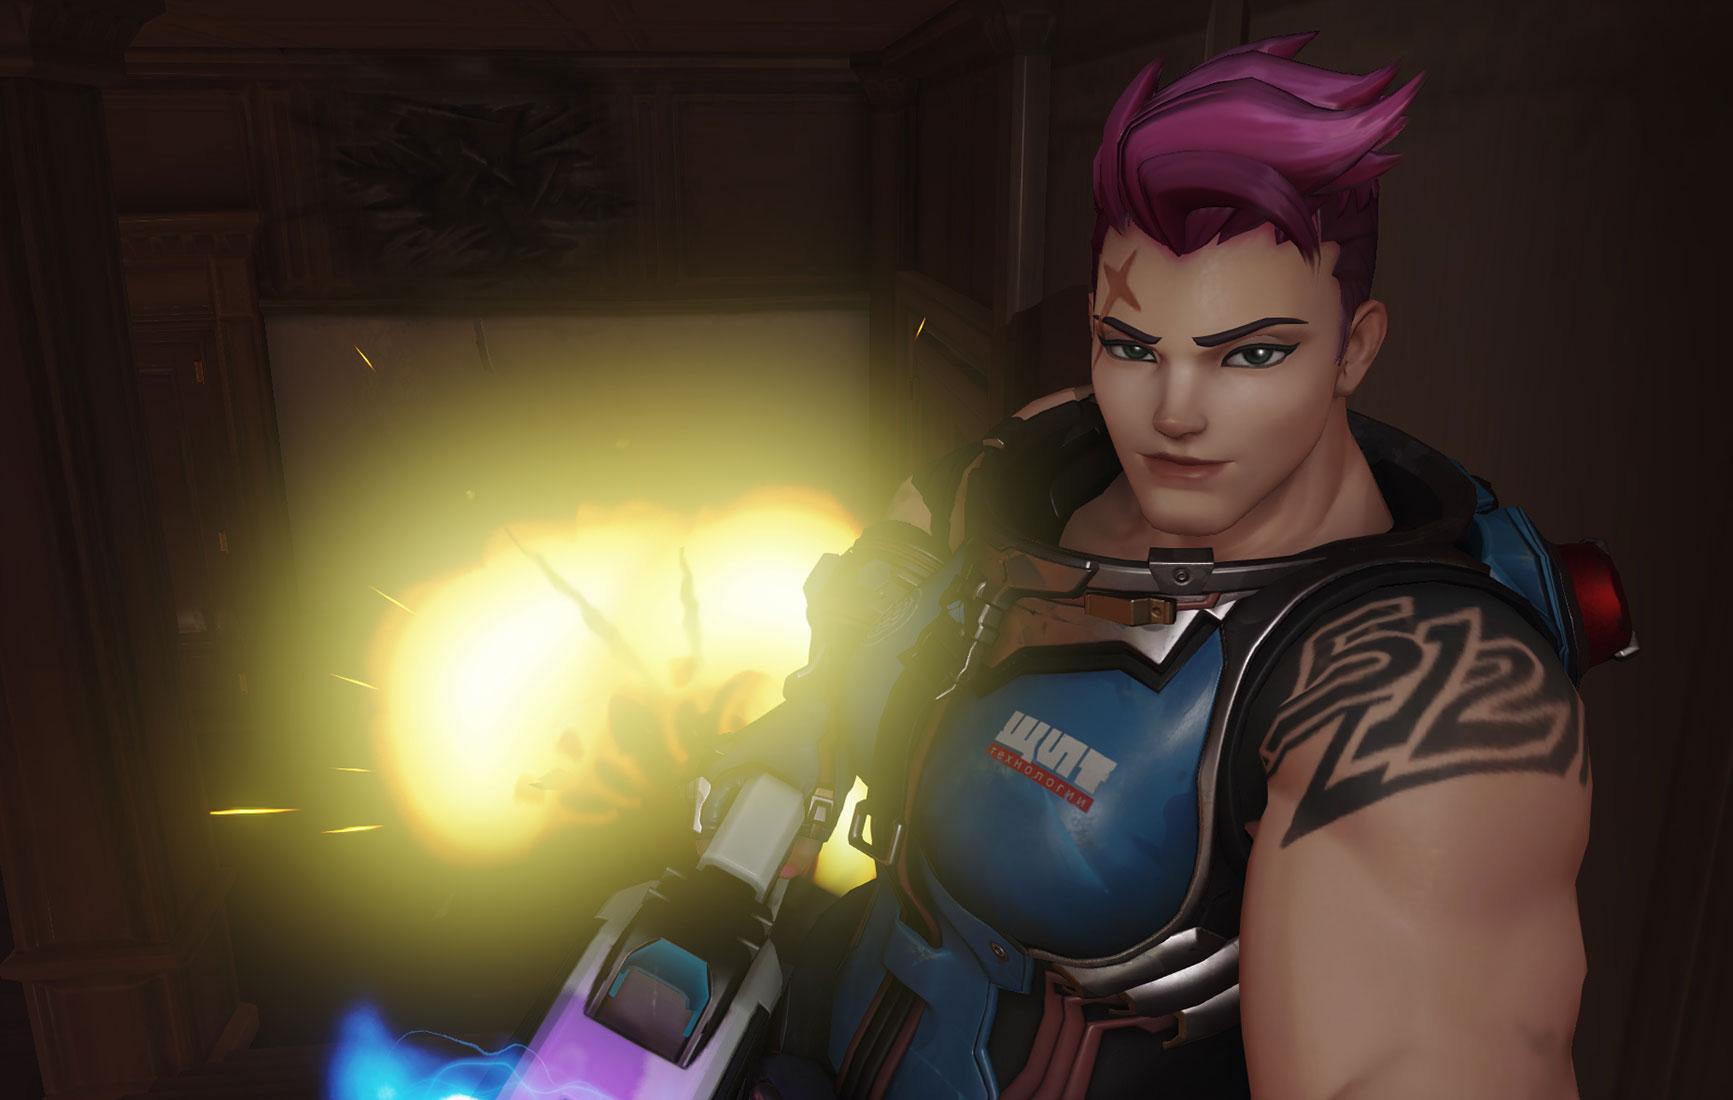 War thunder game debate overwatch tracer and widowmaker